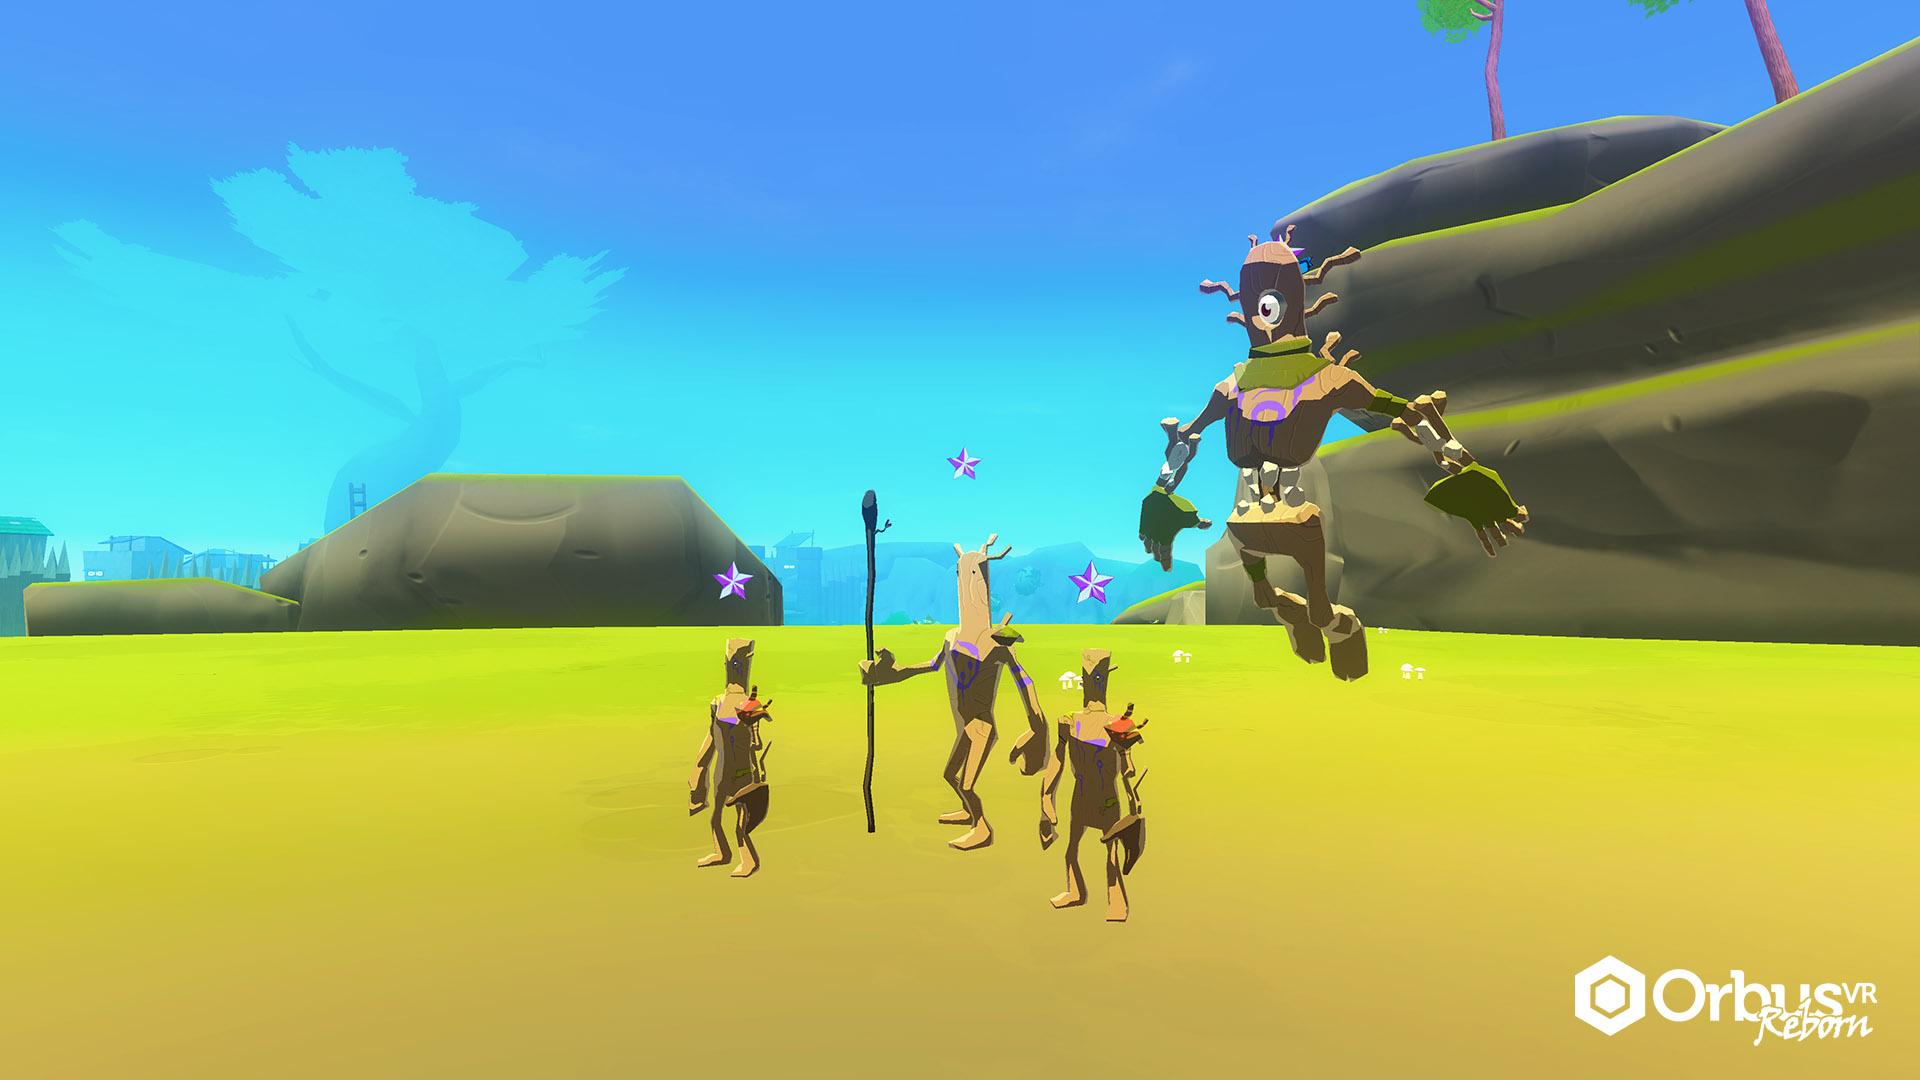 OrbusVR: Reborn :: Fantasy virtual reality MMO for HTC Vive